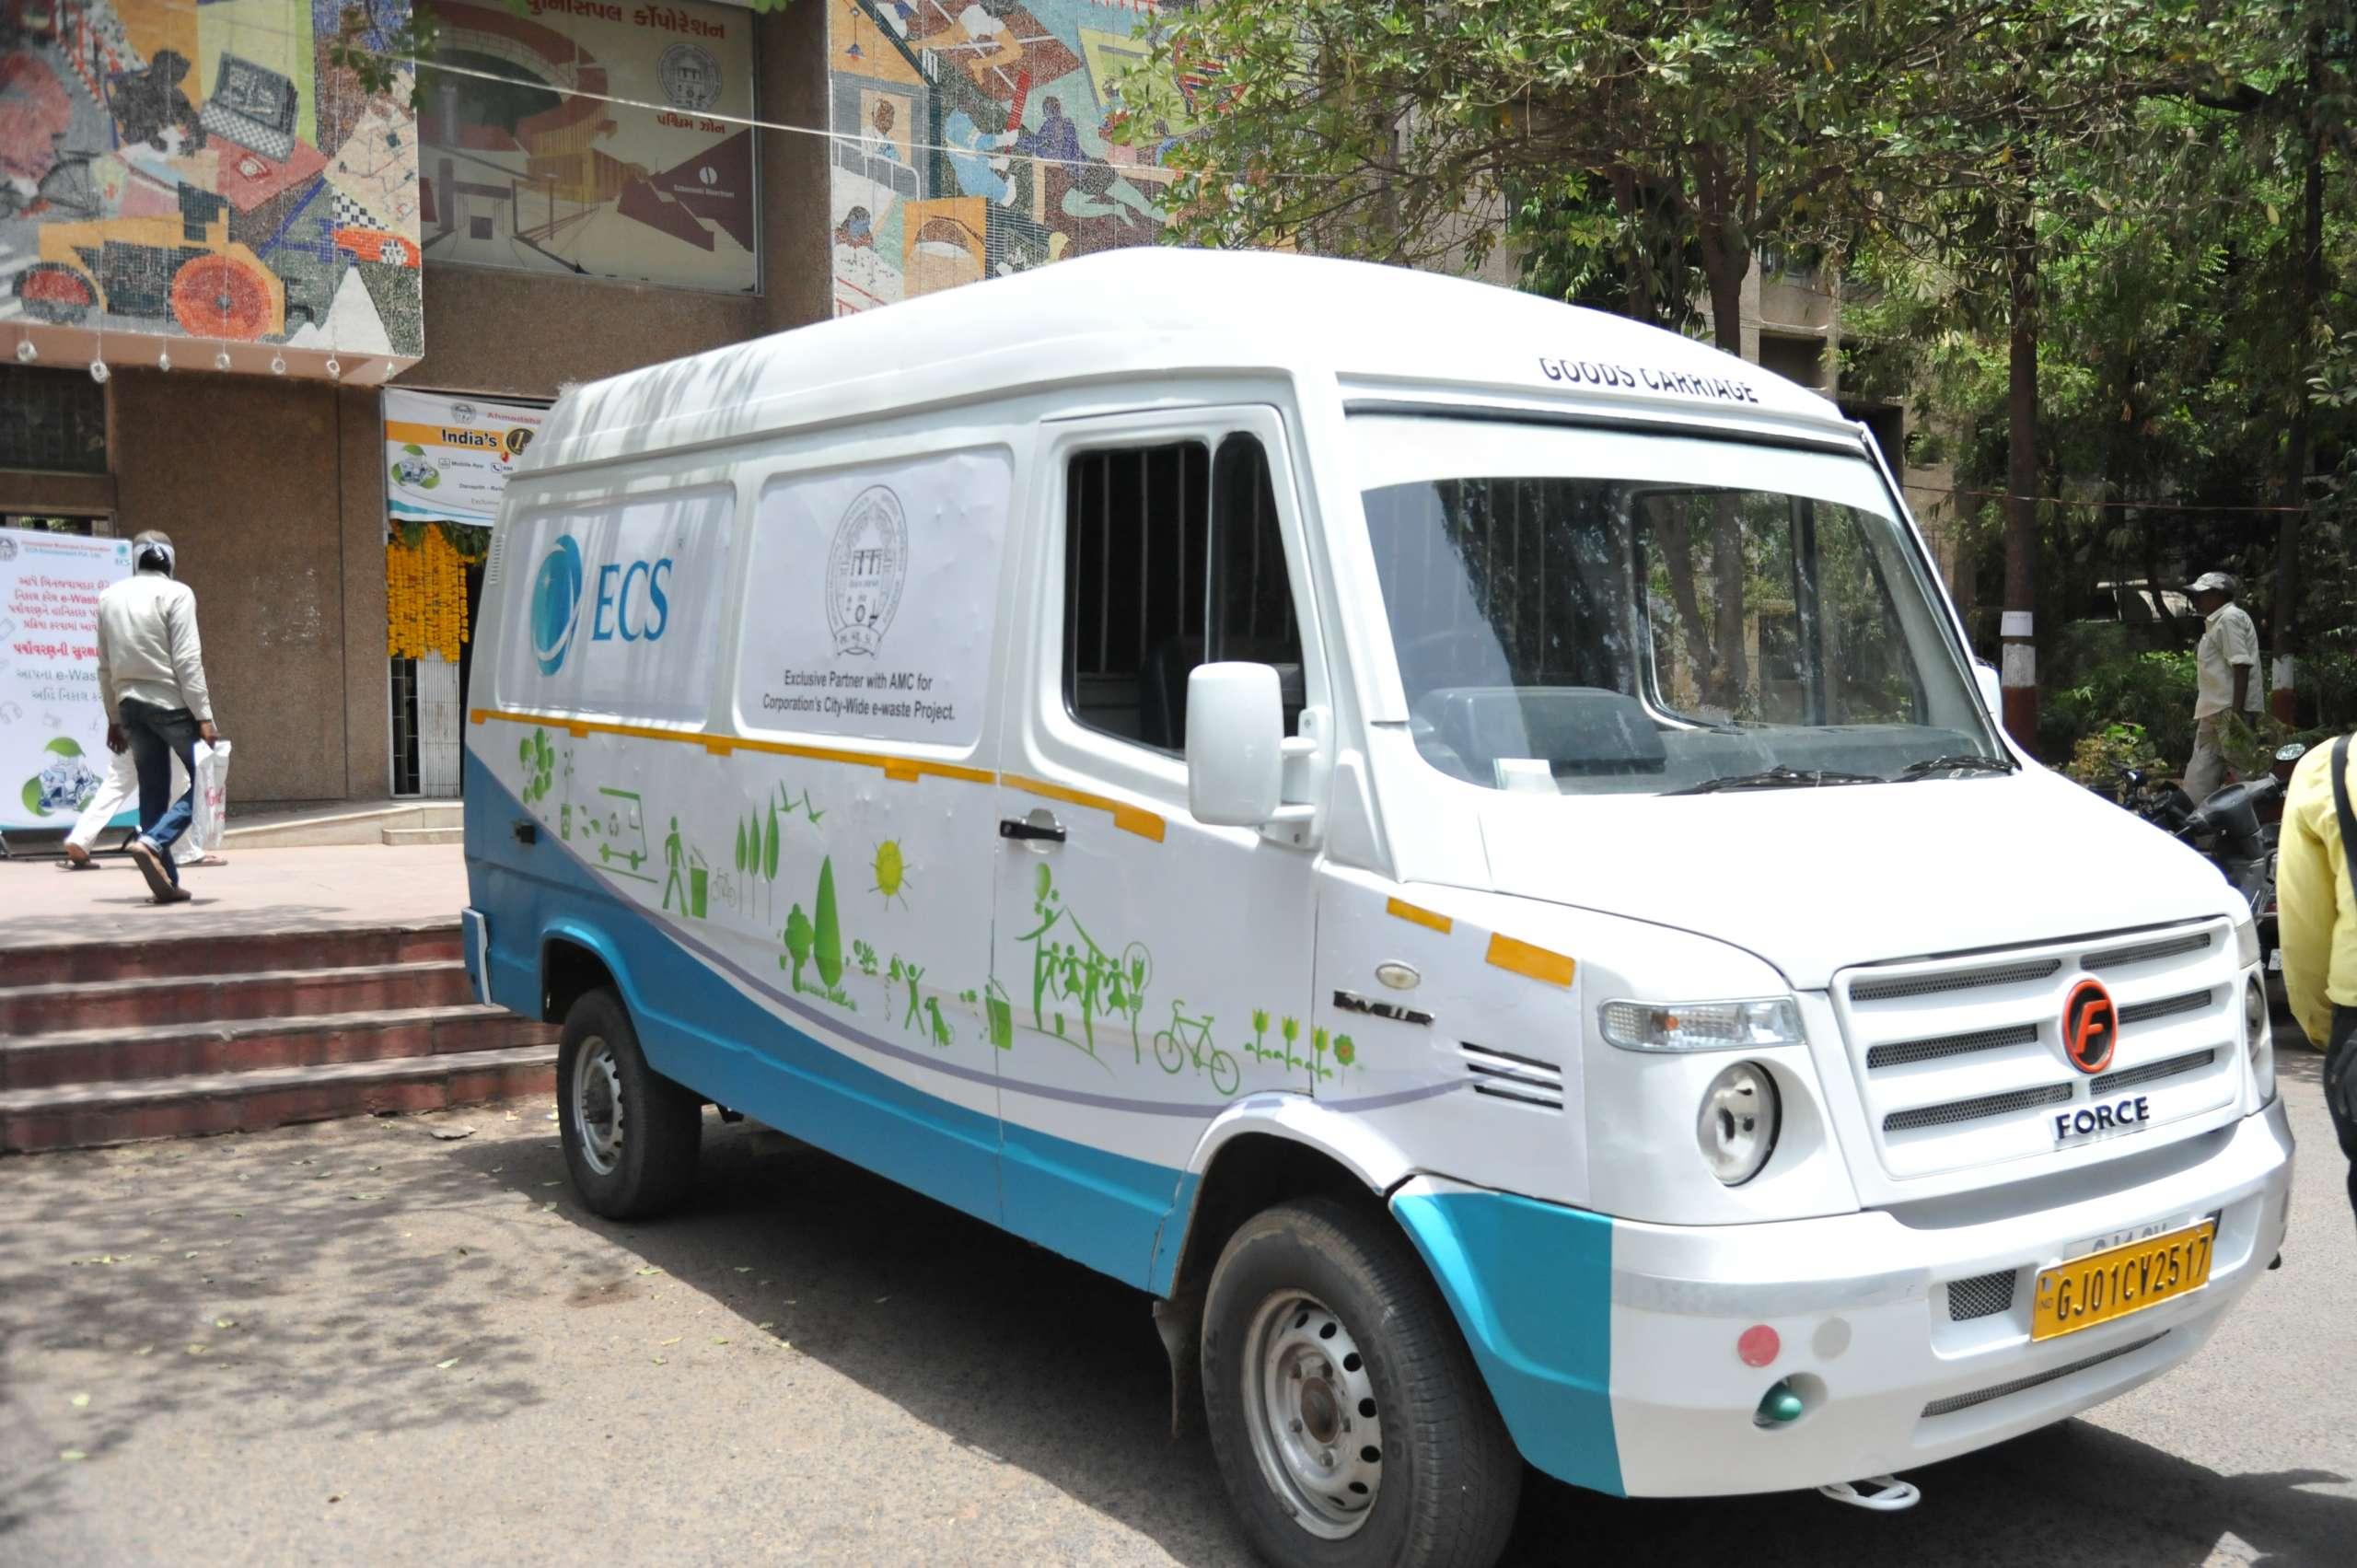 e-Waste pick up vehicle